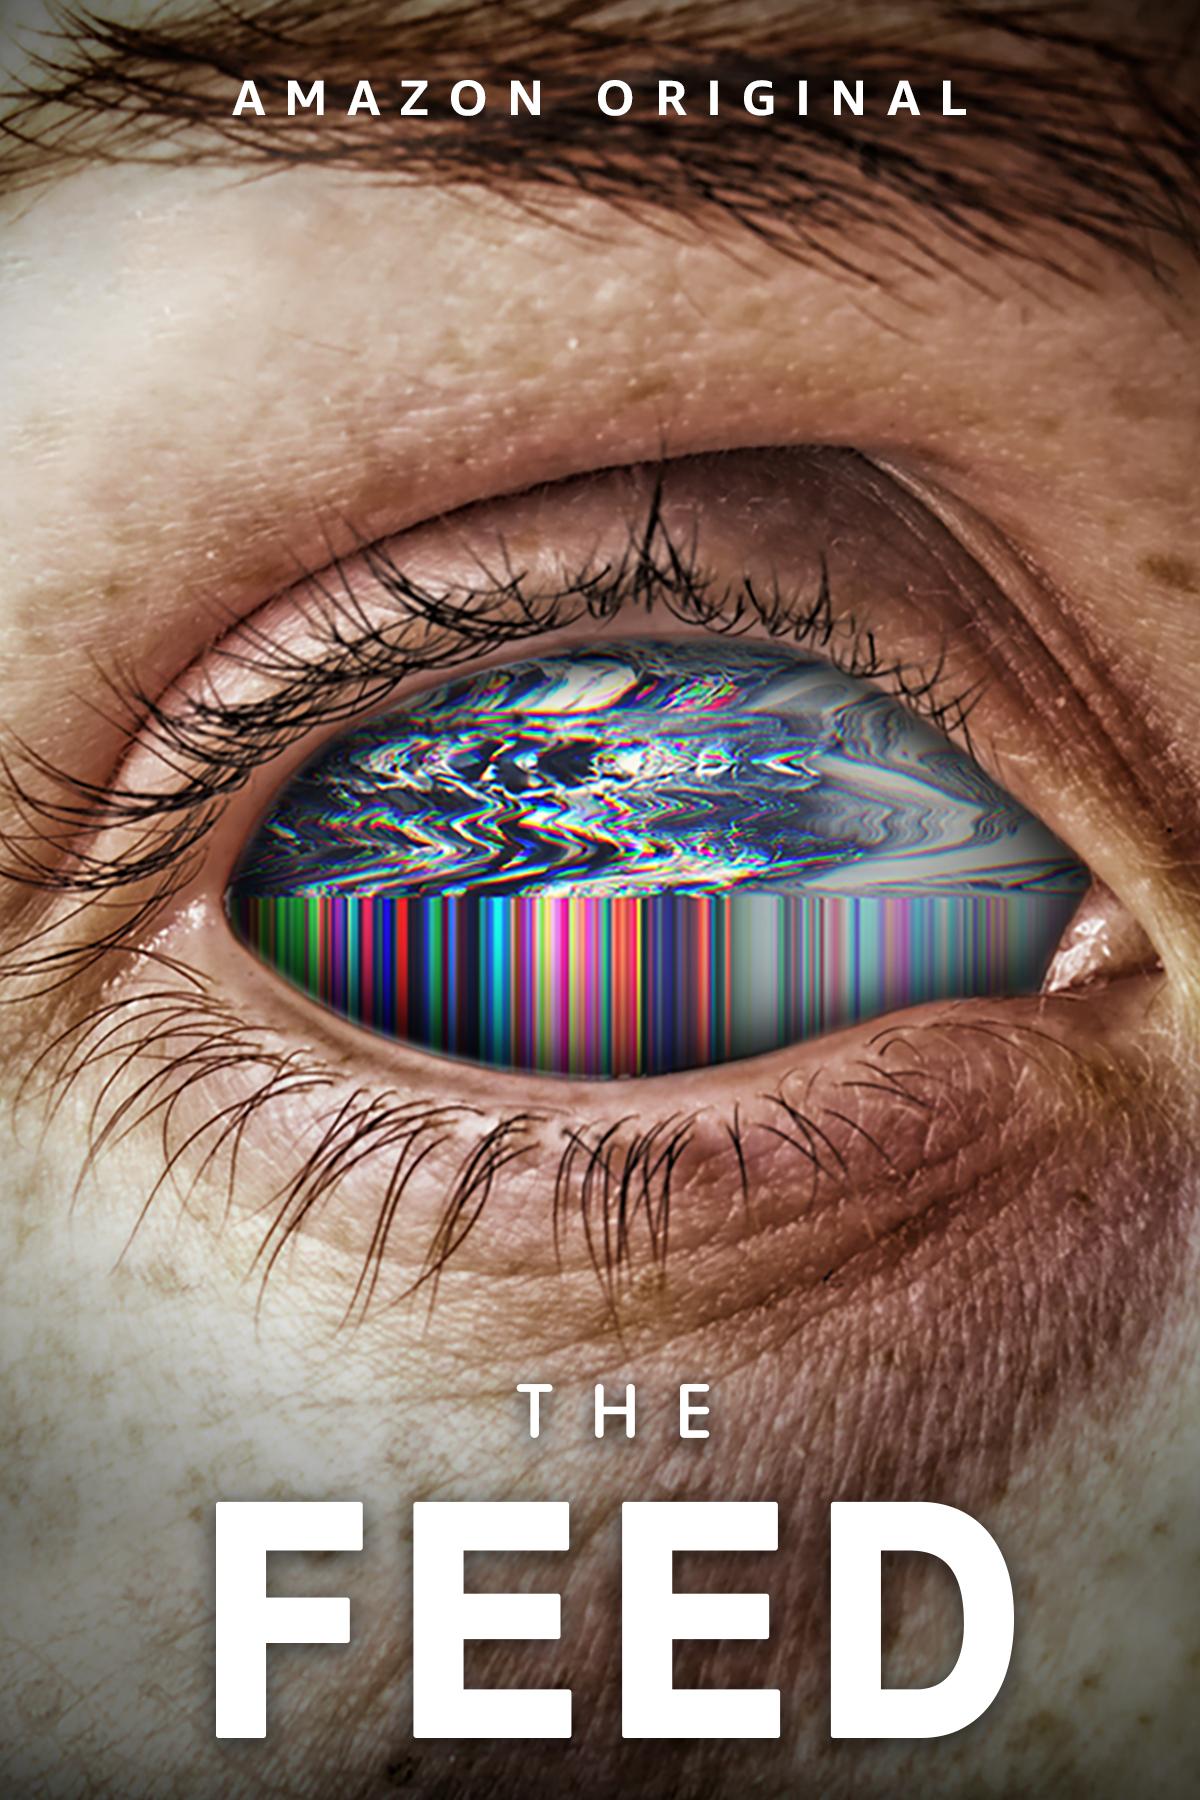 THE FEED (1 Sezonas)